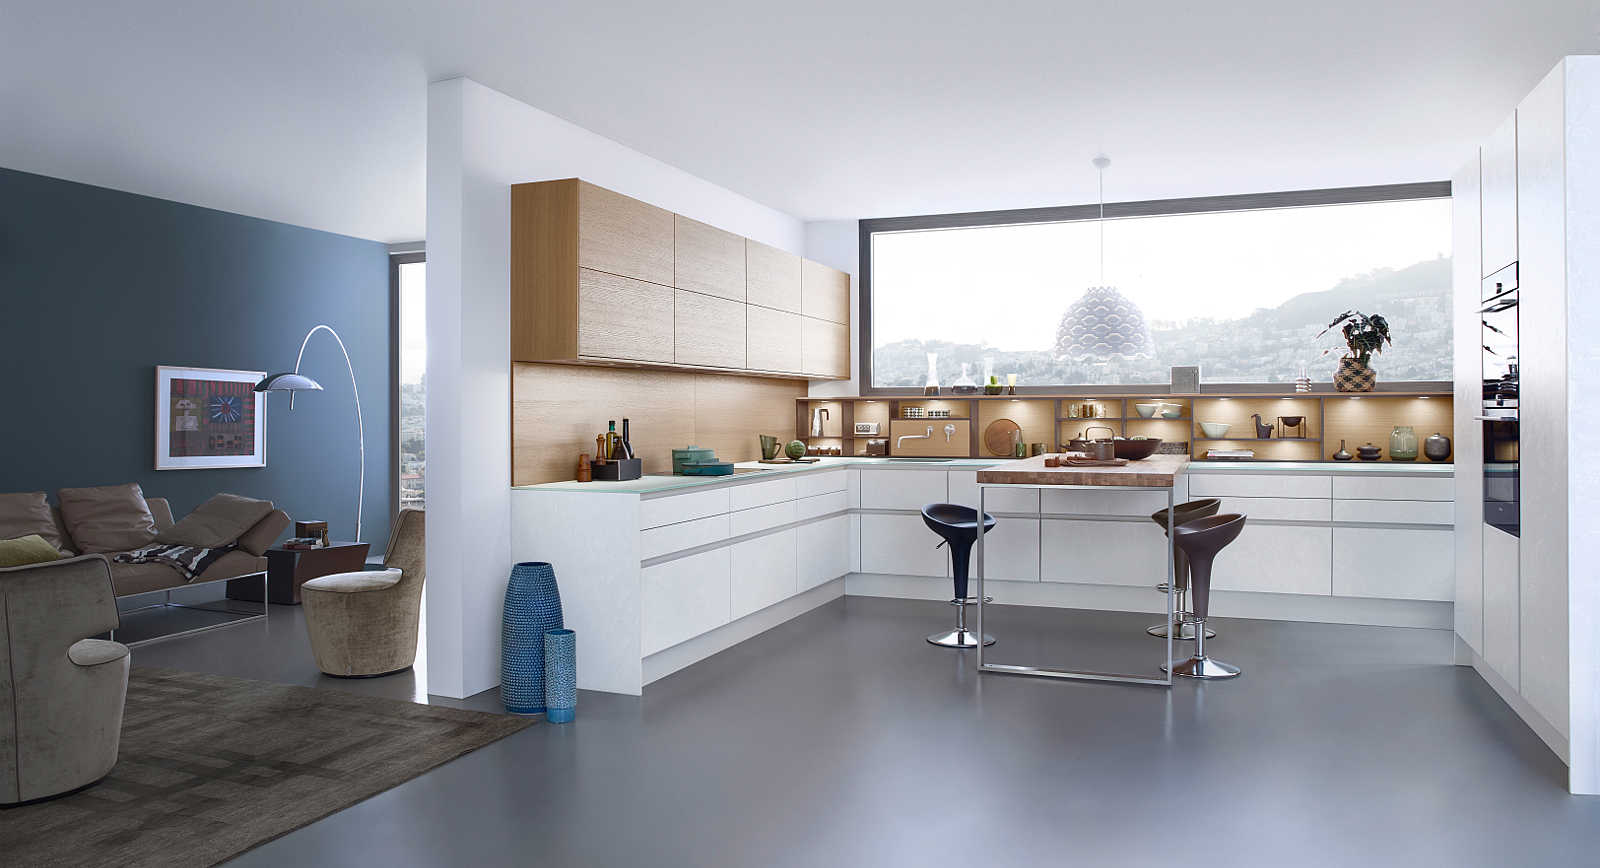 leicht k chen bonn k ln k chen galerie bonn. Black Bedroom Furniture Sets. Home Design Ideas